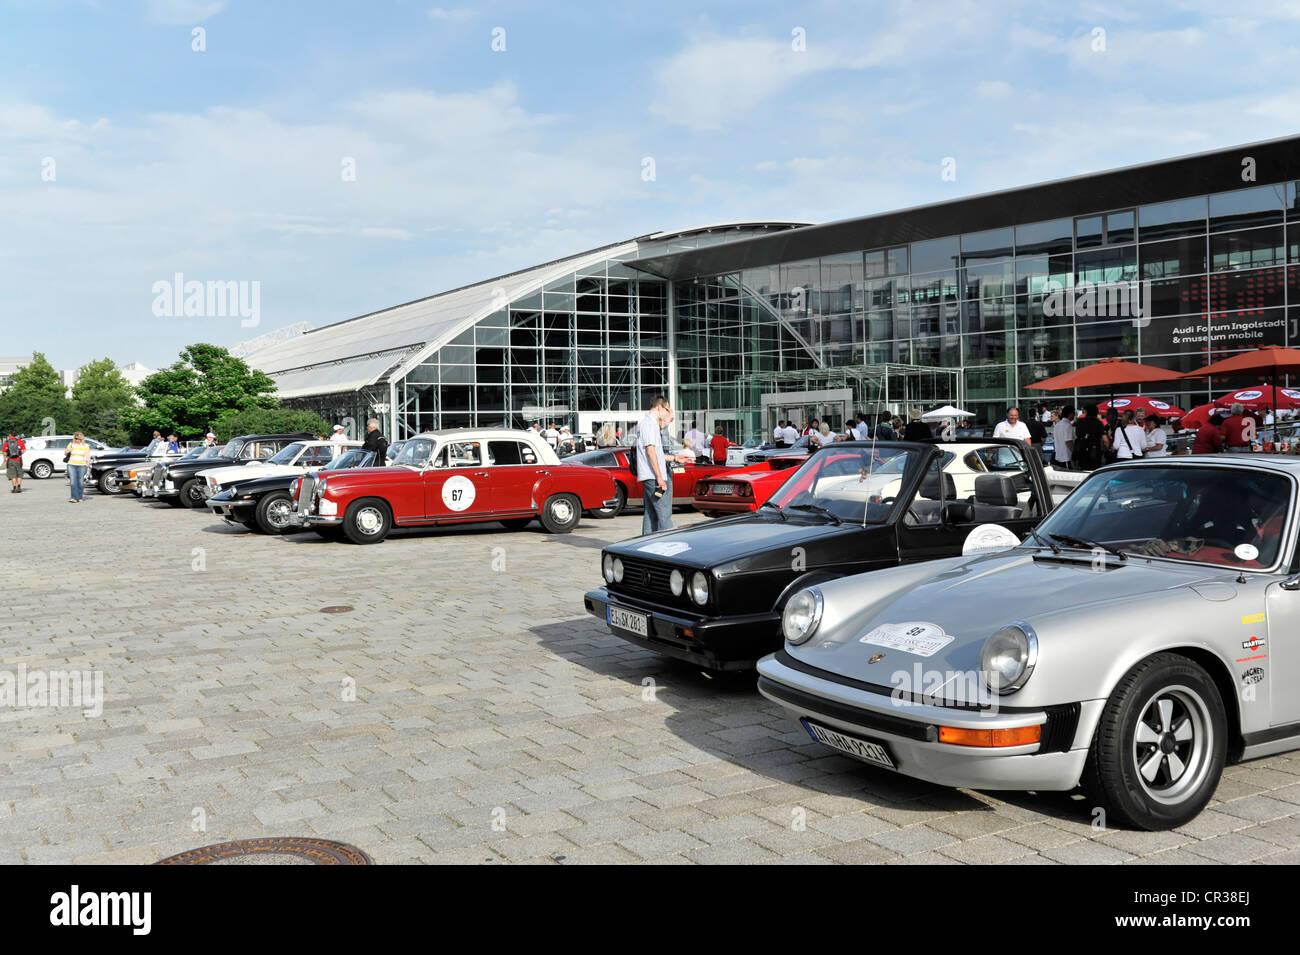 Vintage cars in car park, AUDI Erlebniswelt, Audi Forum, Donau Classic 2011, Ingolstadt, Bavaria, Germany, Europe - Stock Image